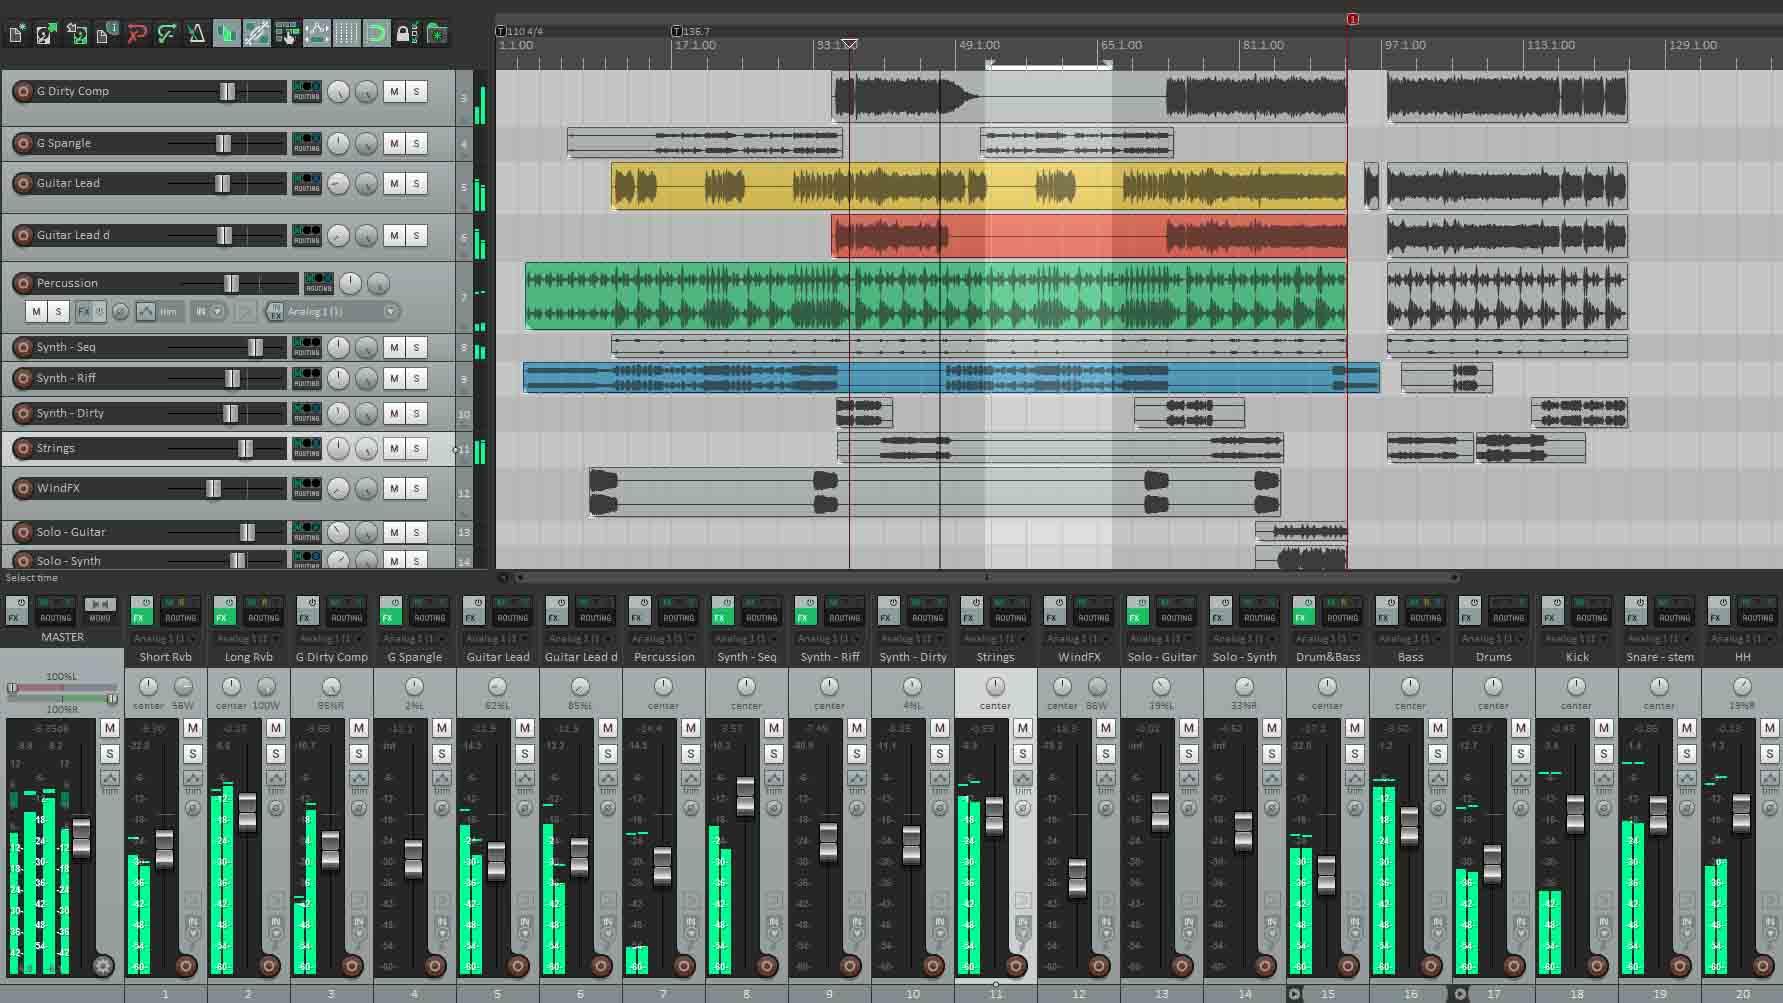 Cockos Reaper 5 - Un sequencer a basso costo - Age of Audio